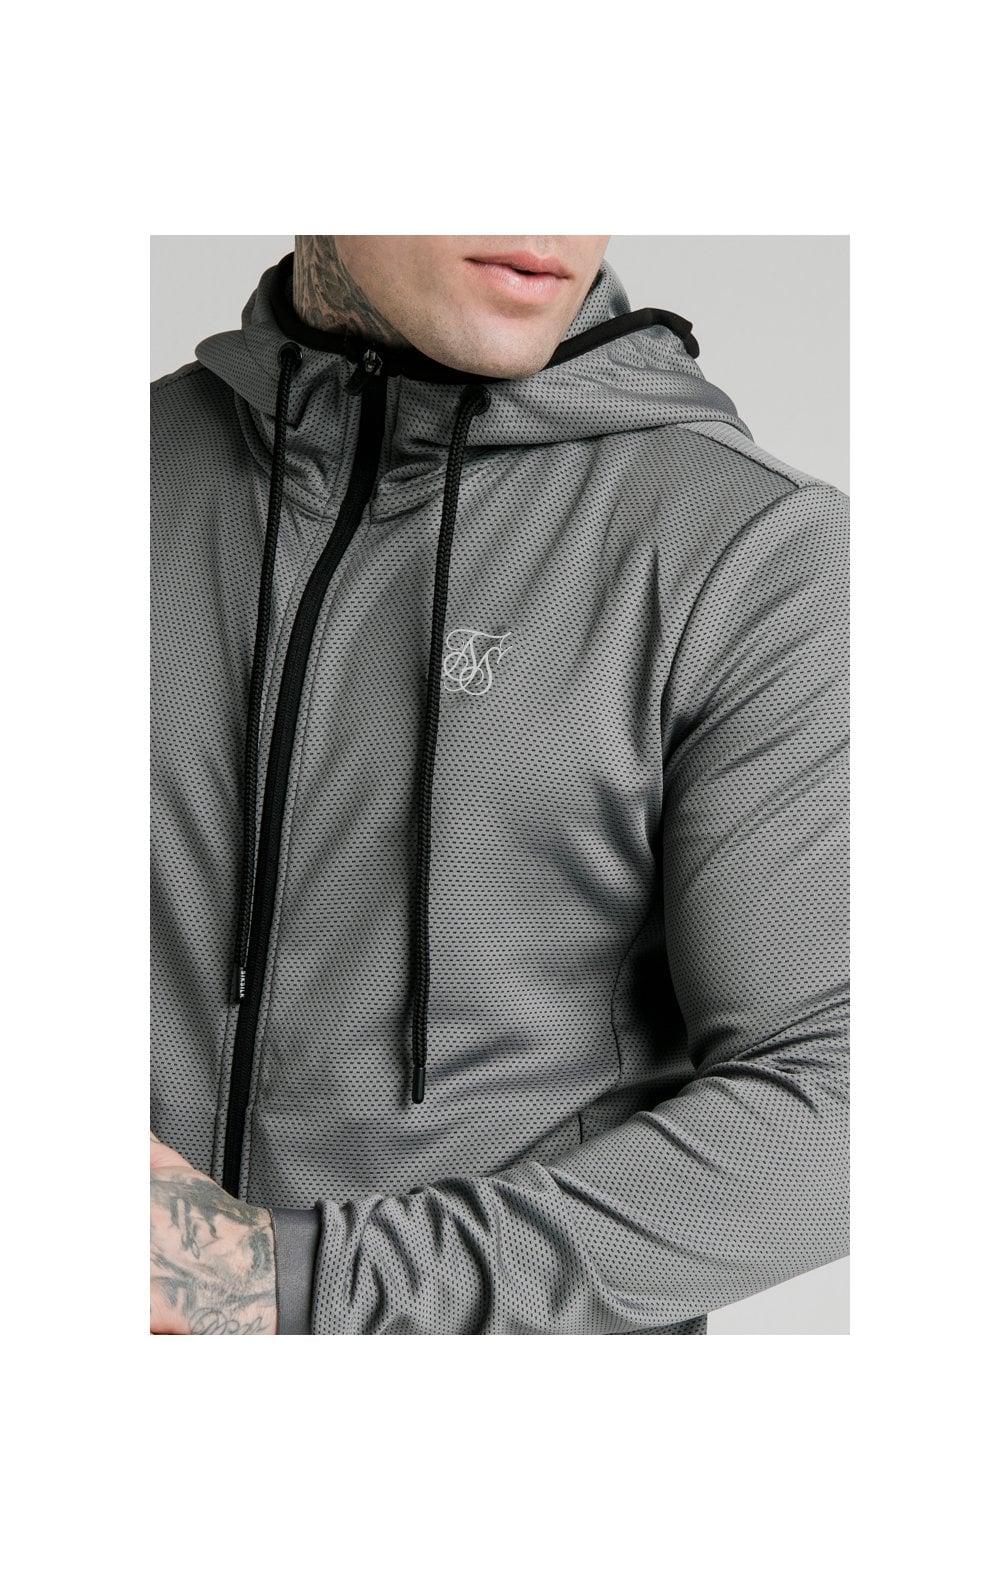 SikSilk Agility Active Zip Through Hoodie - Grey MEN SIZES TOP: Small